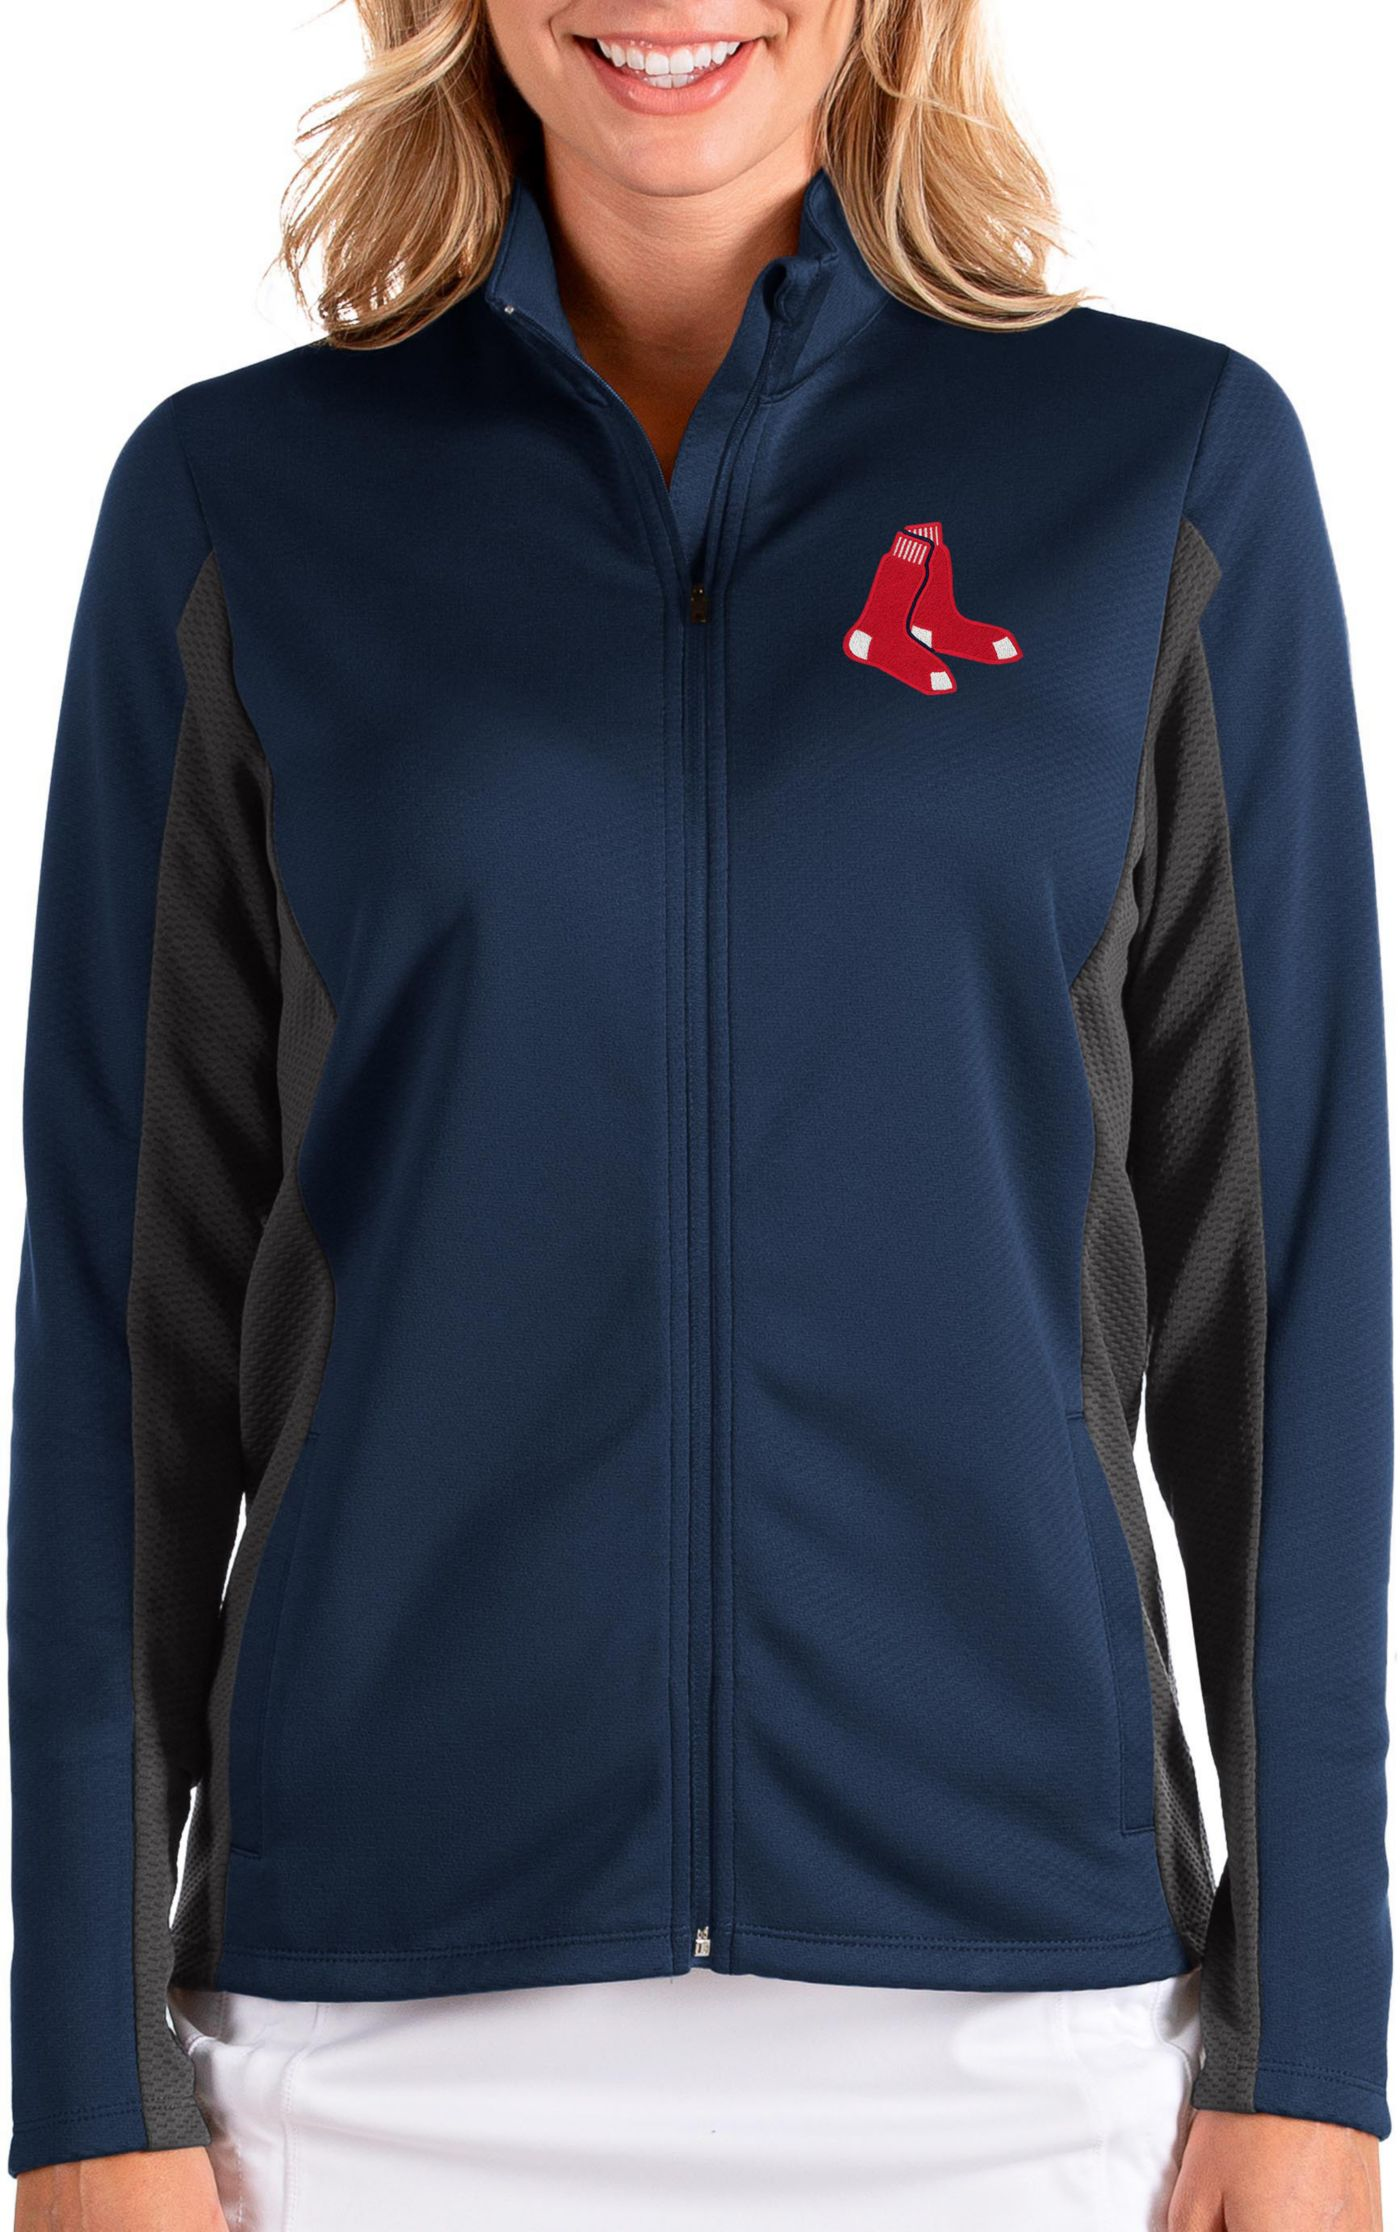 Antigua Women's Boston Red Sox Navy Passage Full-Zip Jacket